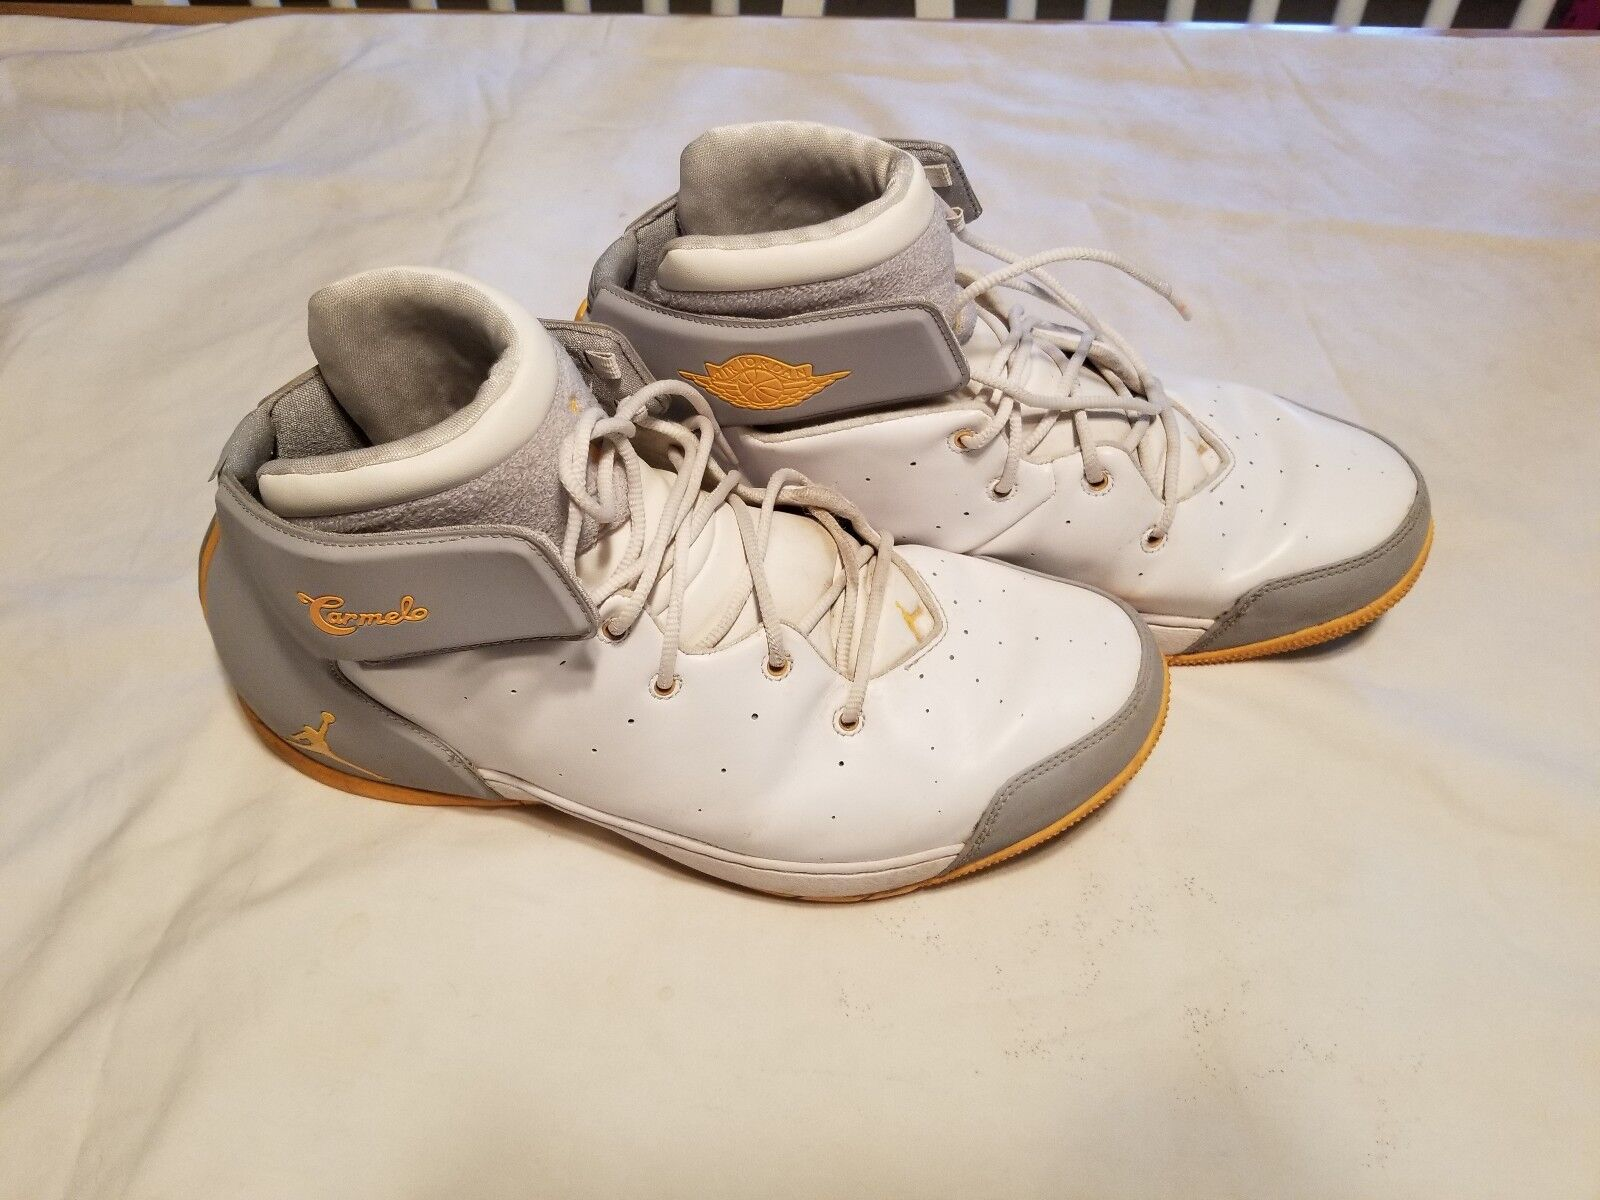 Nike Air Jordan Carmelo 1.5 2005 All Star Price reduction Seasonal clearance sale